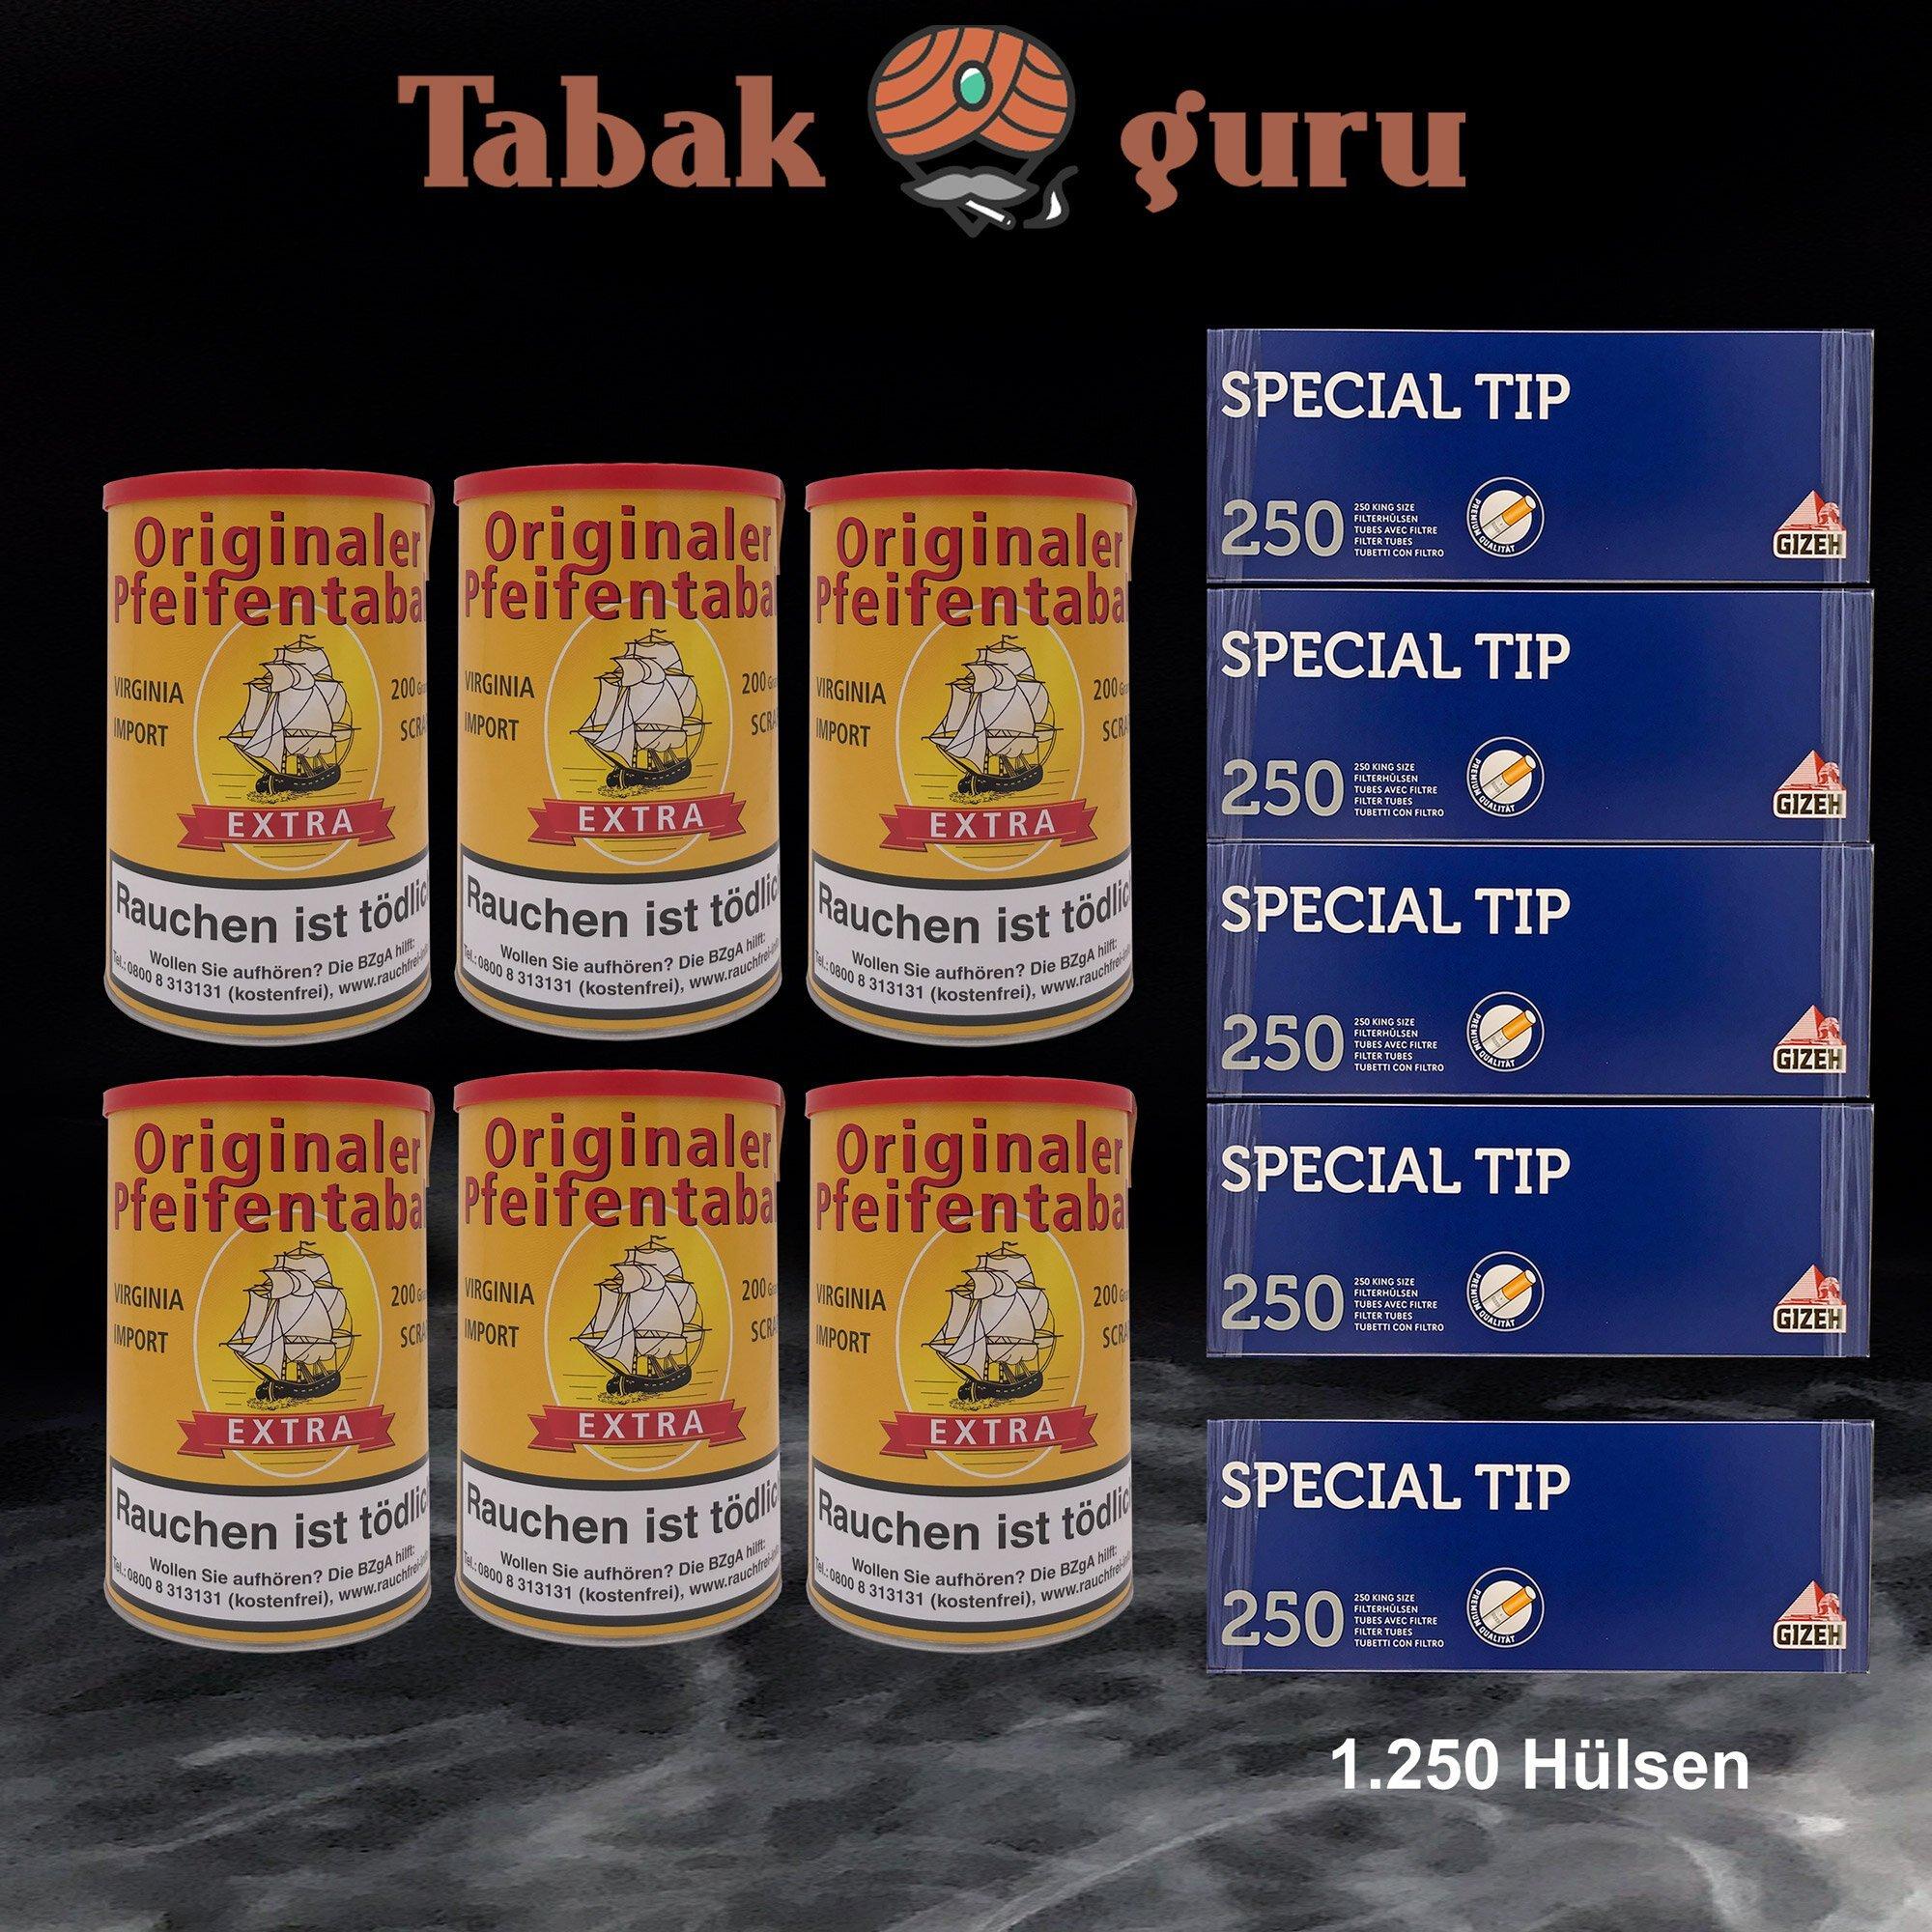 6 x Originaler Pfeifentabak Extra á 200g + 1.250 Gizeh Special Tip Hülsen